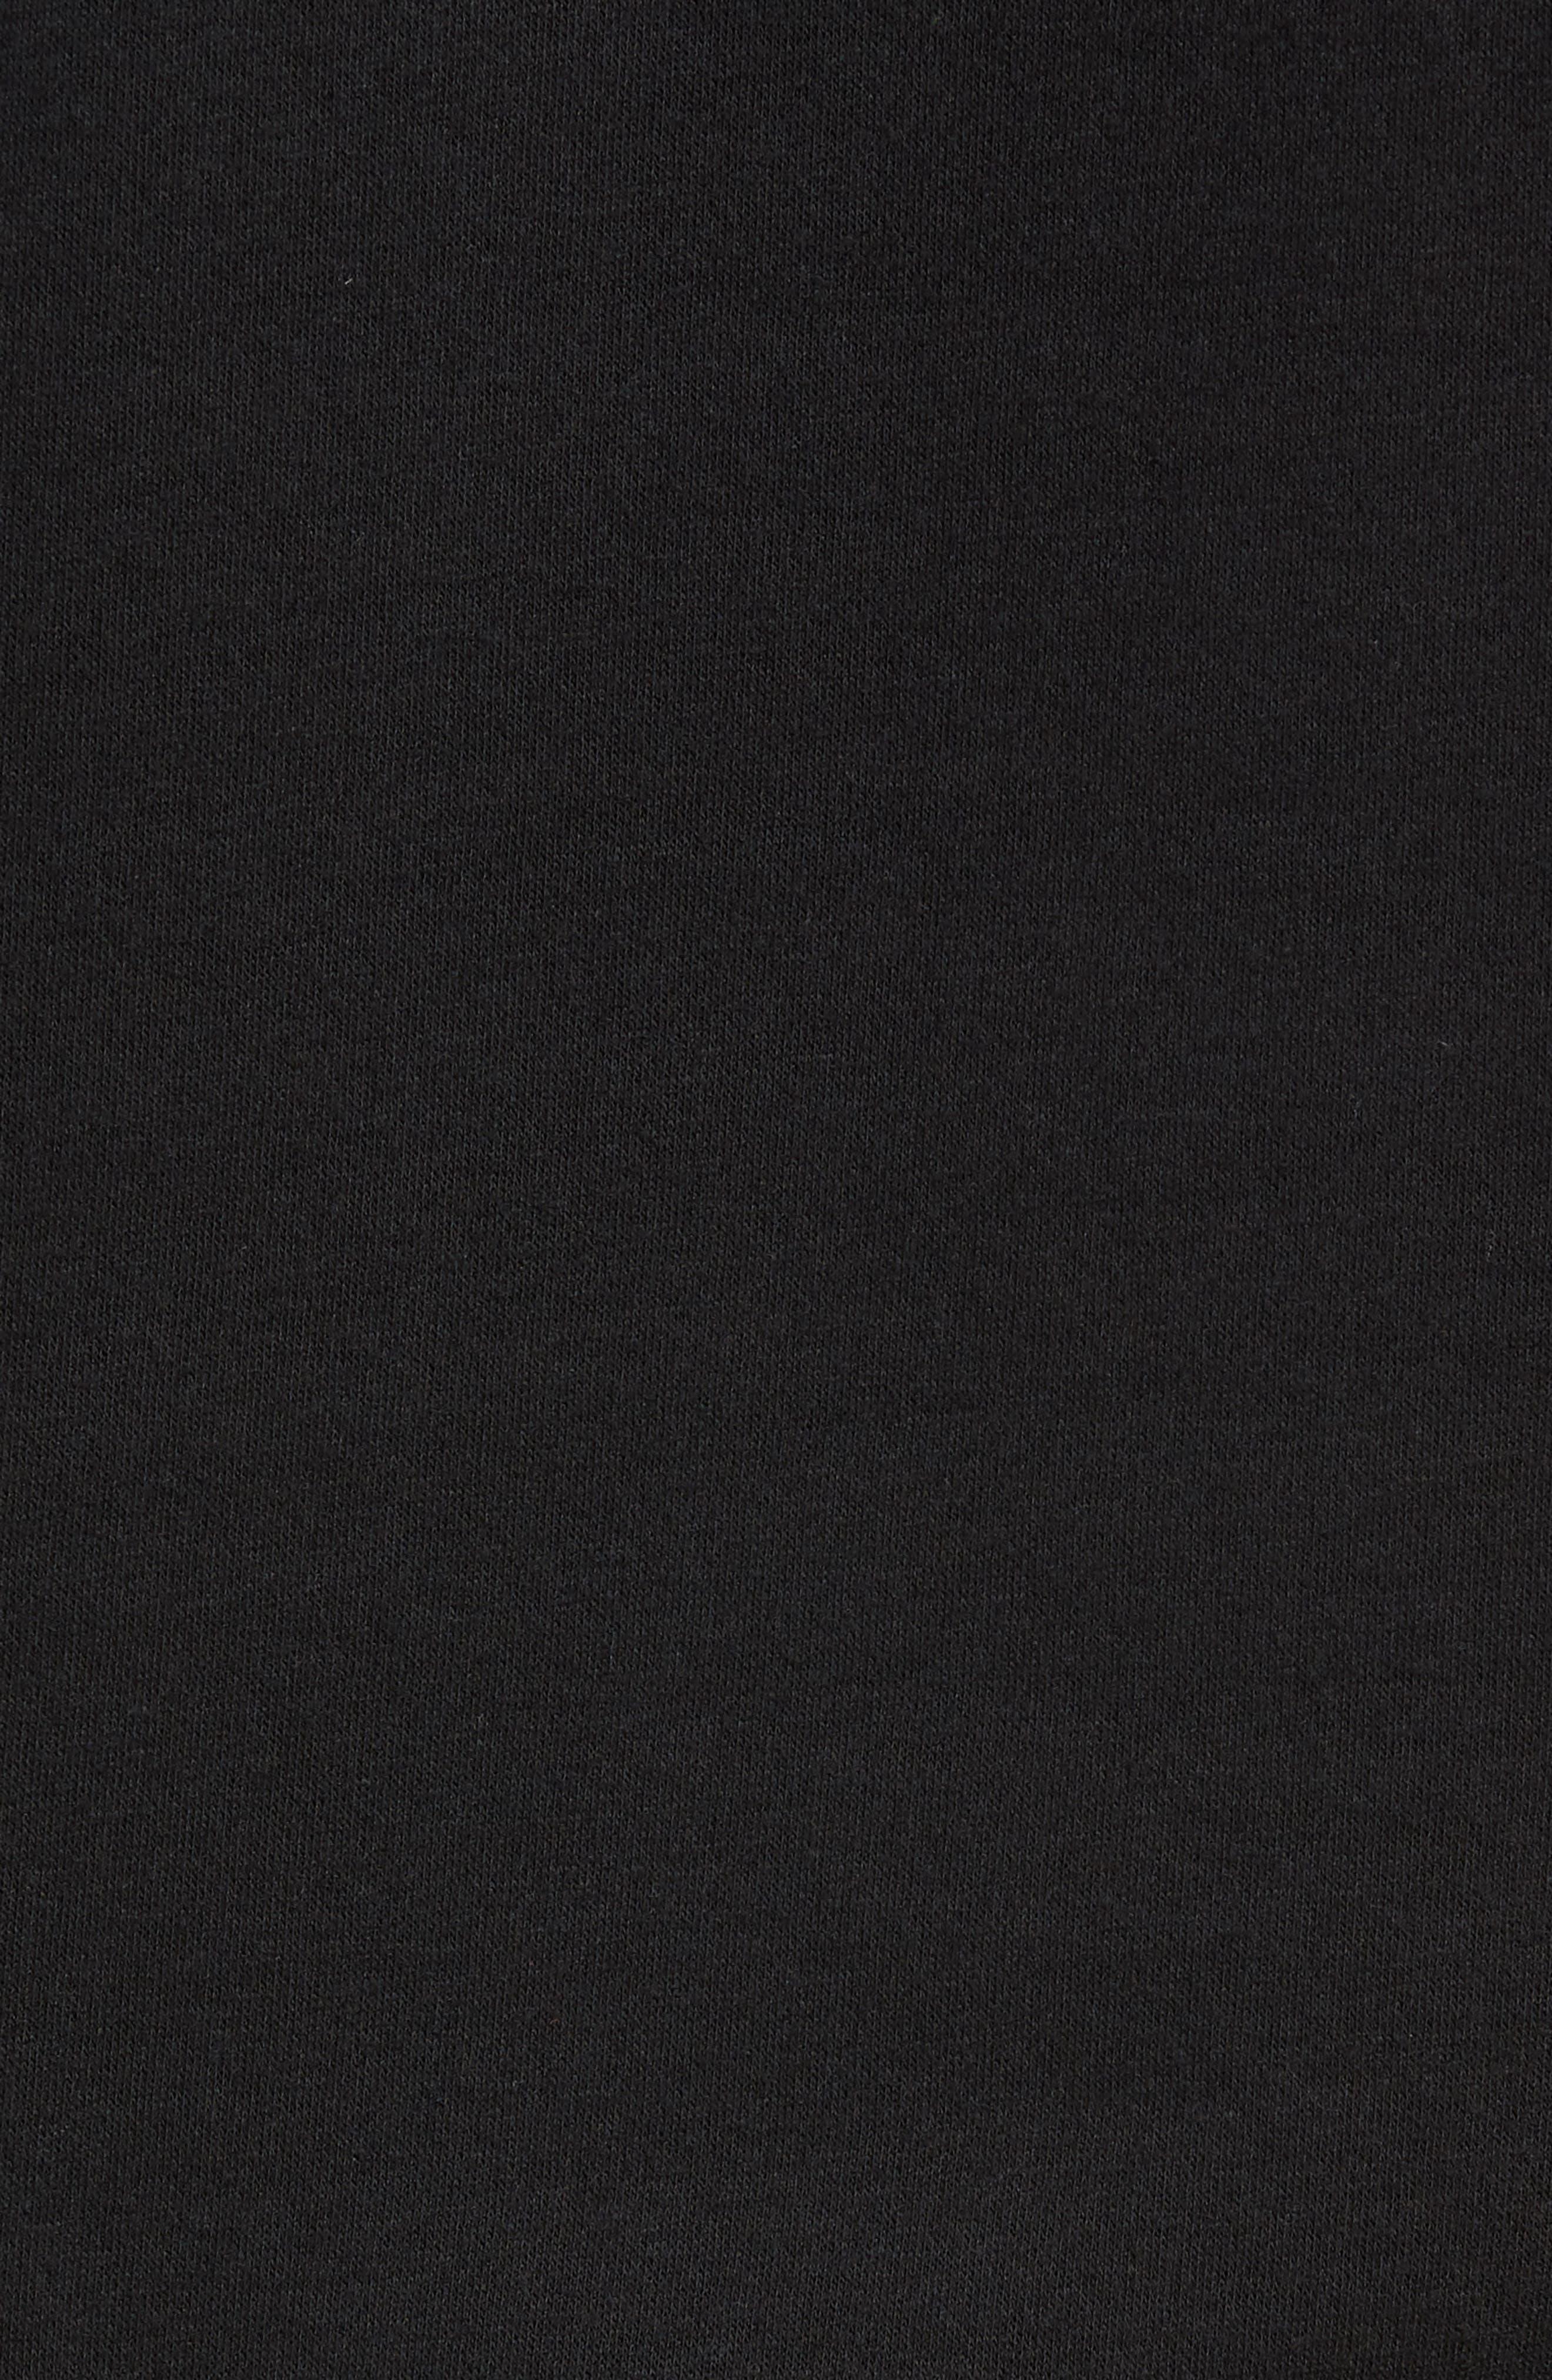 POLO RALPH LAUREN,                             Brushed Jersey Cotton Blend Crewneck Sweatshirt,                             Alternate thumbnail 5, color,                             POLO BLACK